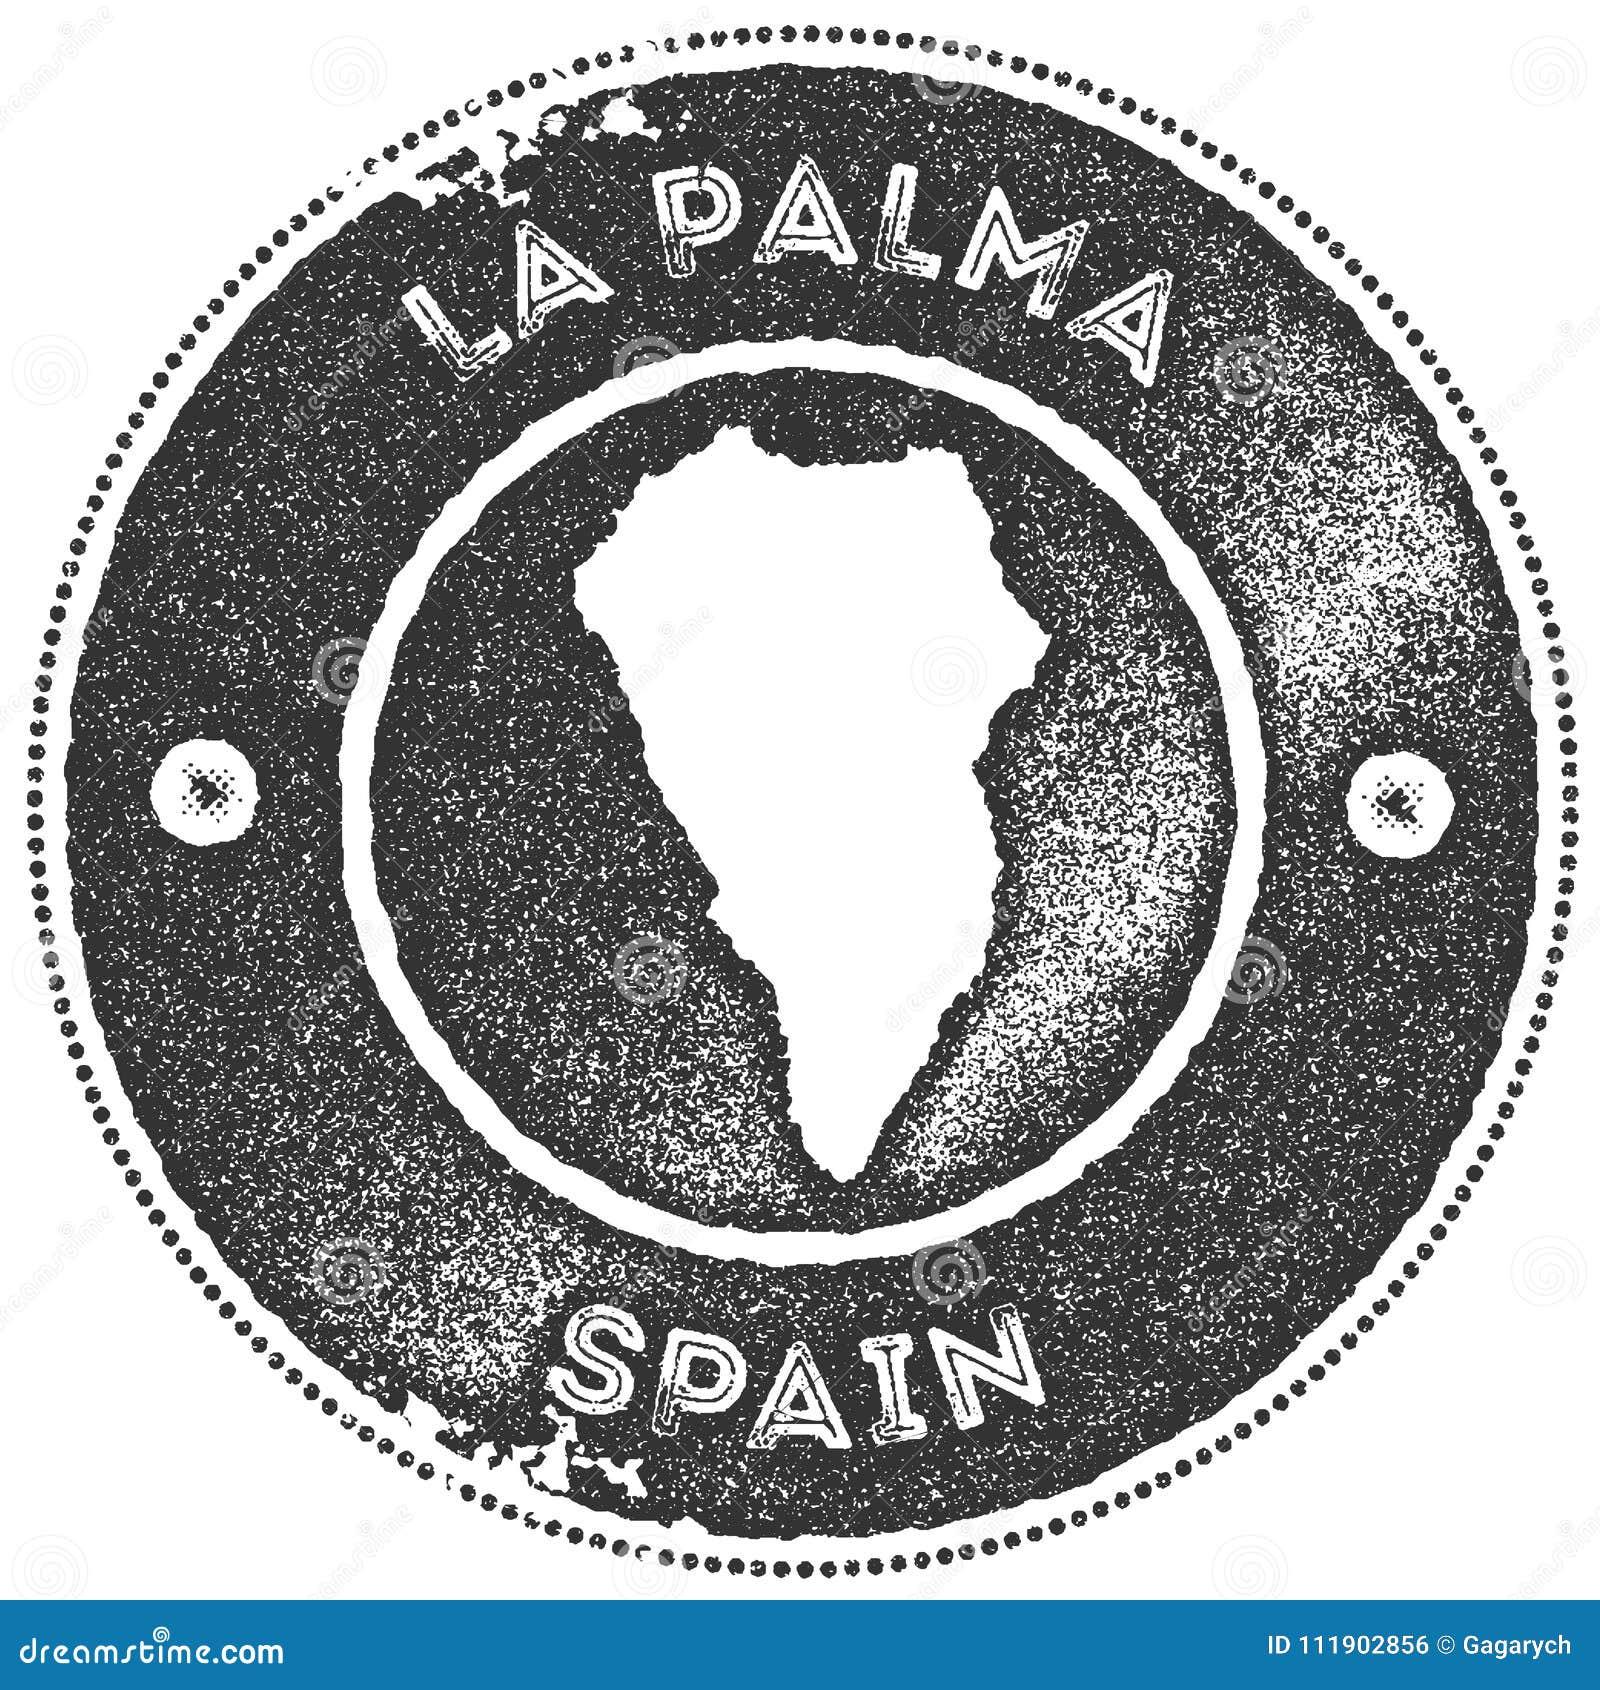 La Palma Map Vintage Stamp. Stock Vector - Illustration of insignia ...